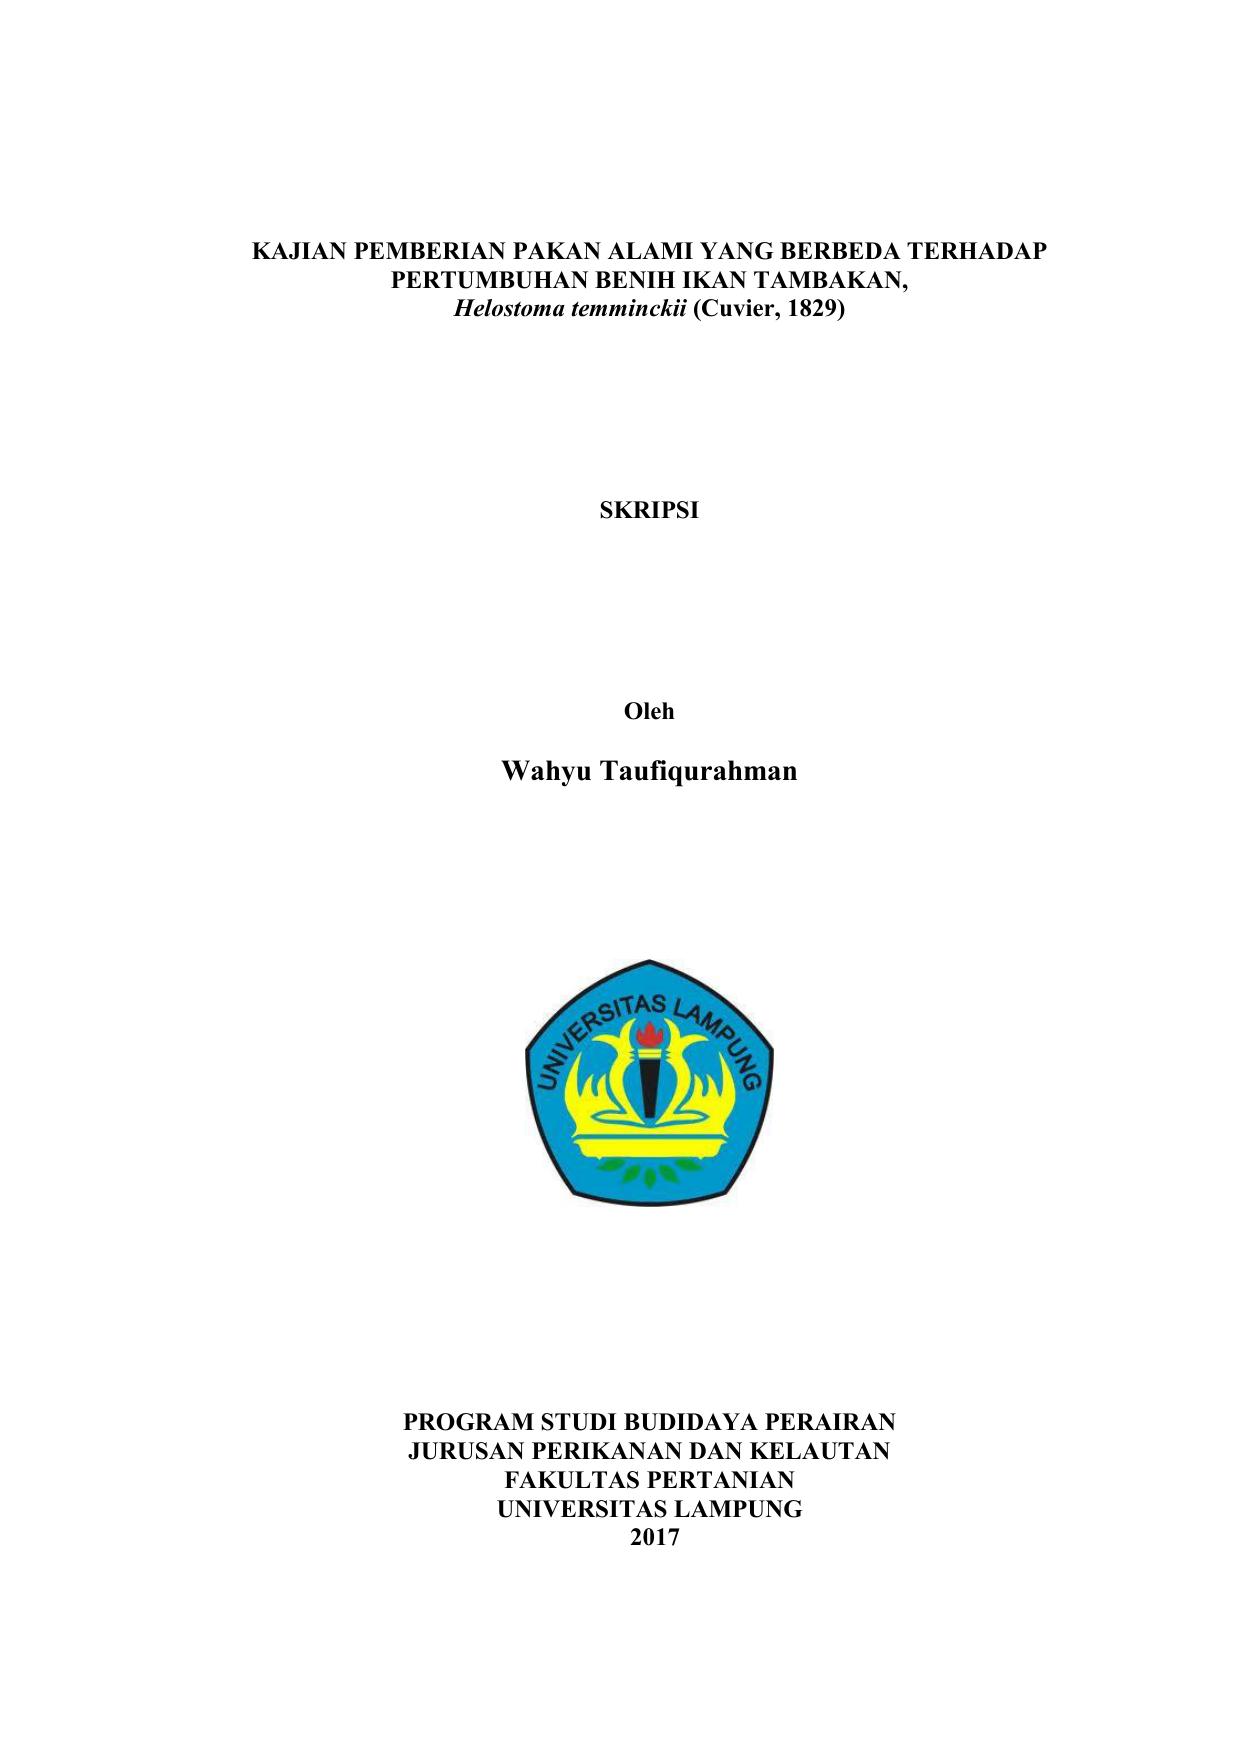 Wahyu Taufiqurahman Digital Library Unila